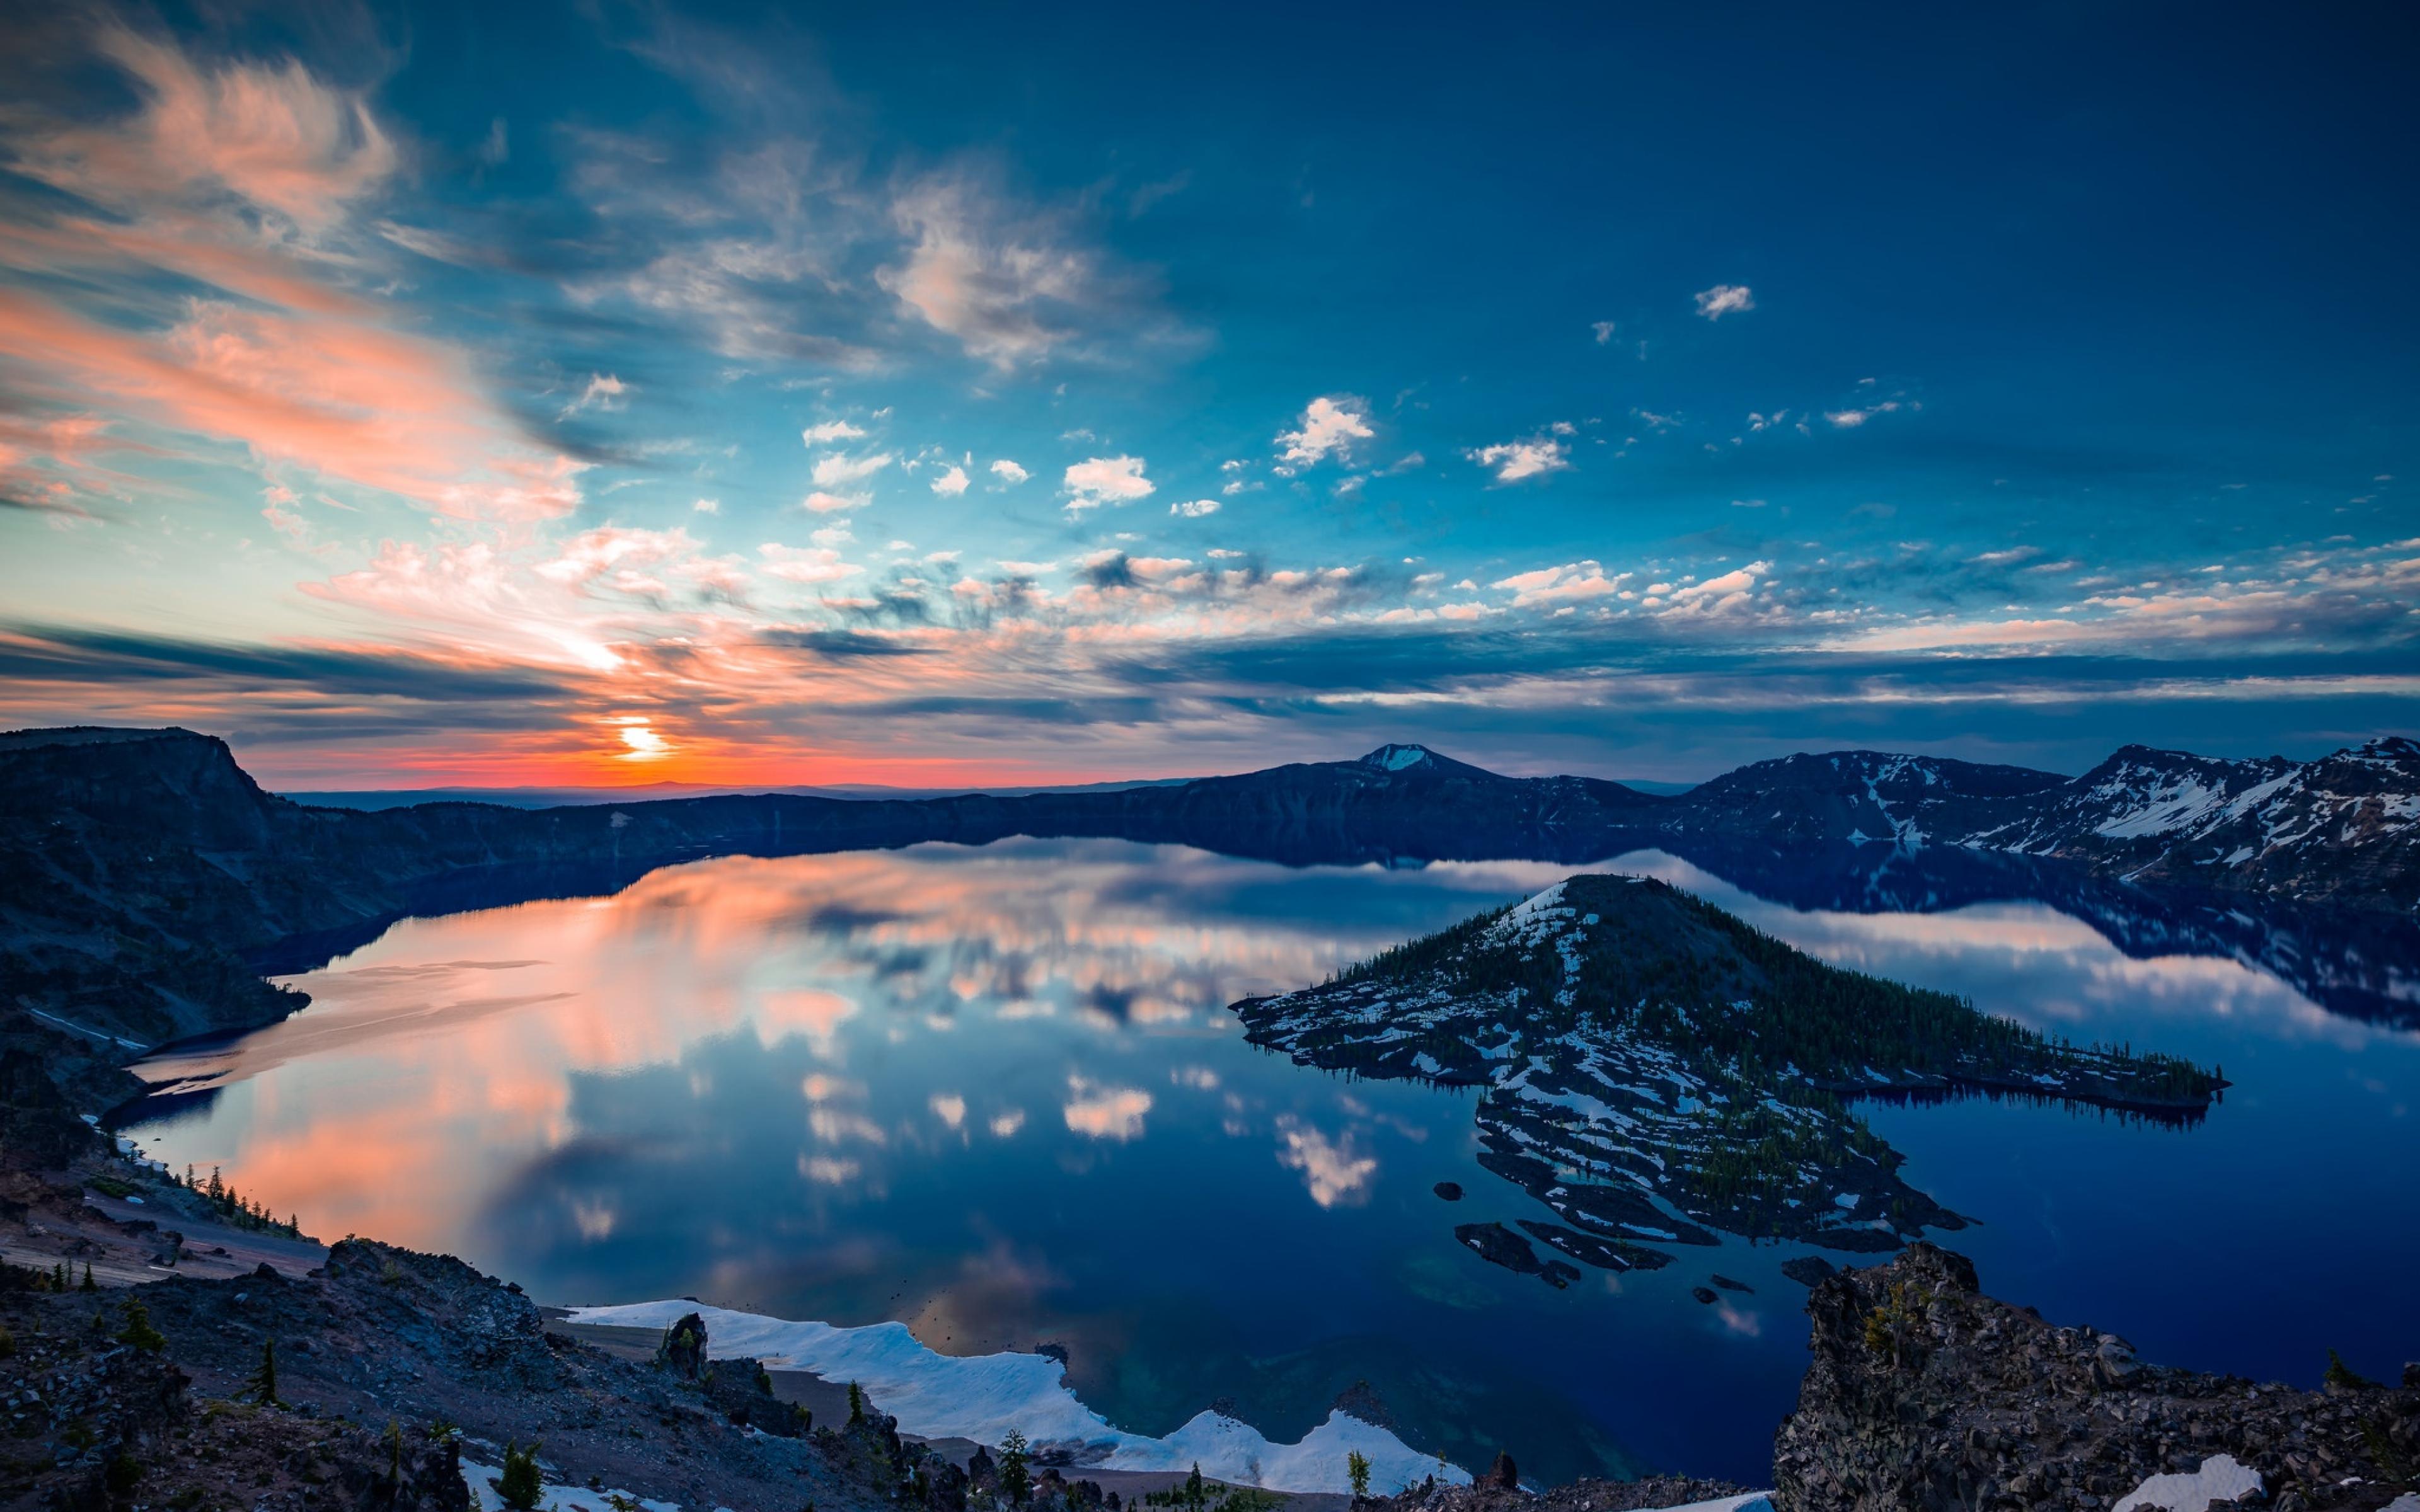 Oregon Wallpapers Hd: Crater Lake Oregon, Full HD 2K Wallpaper